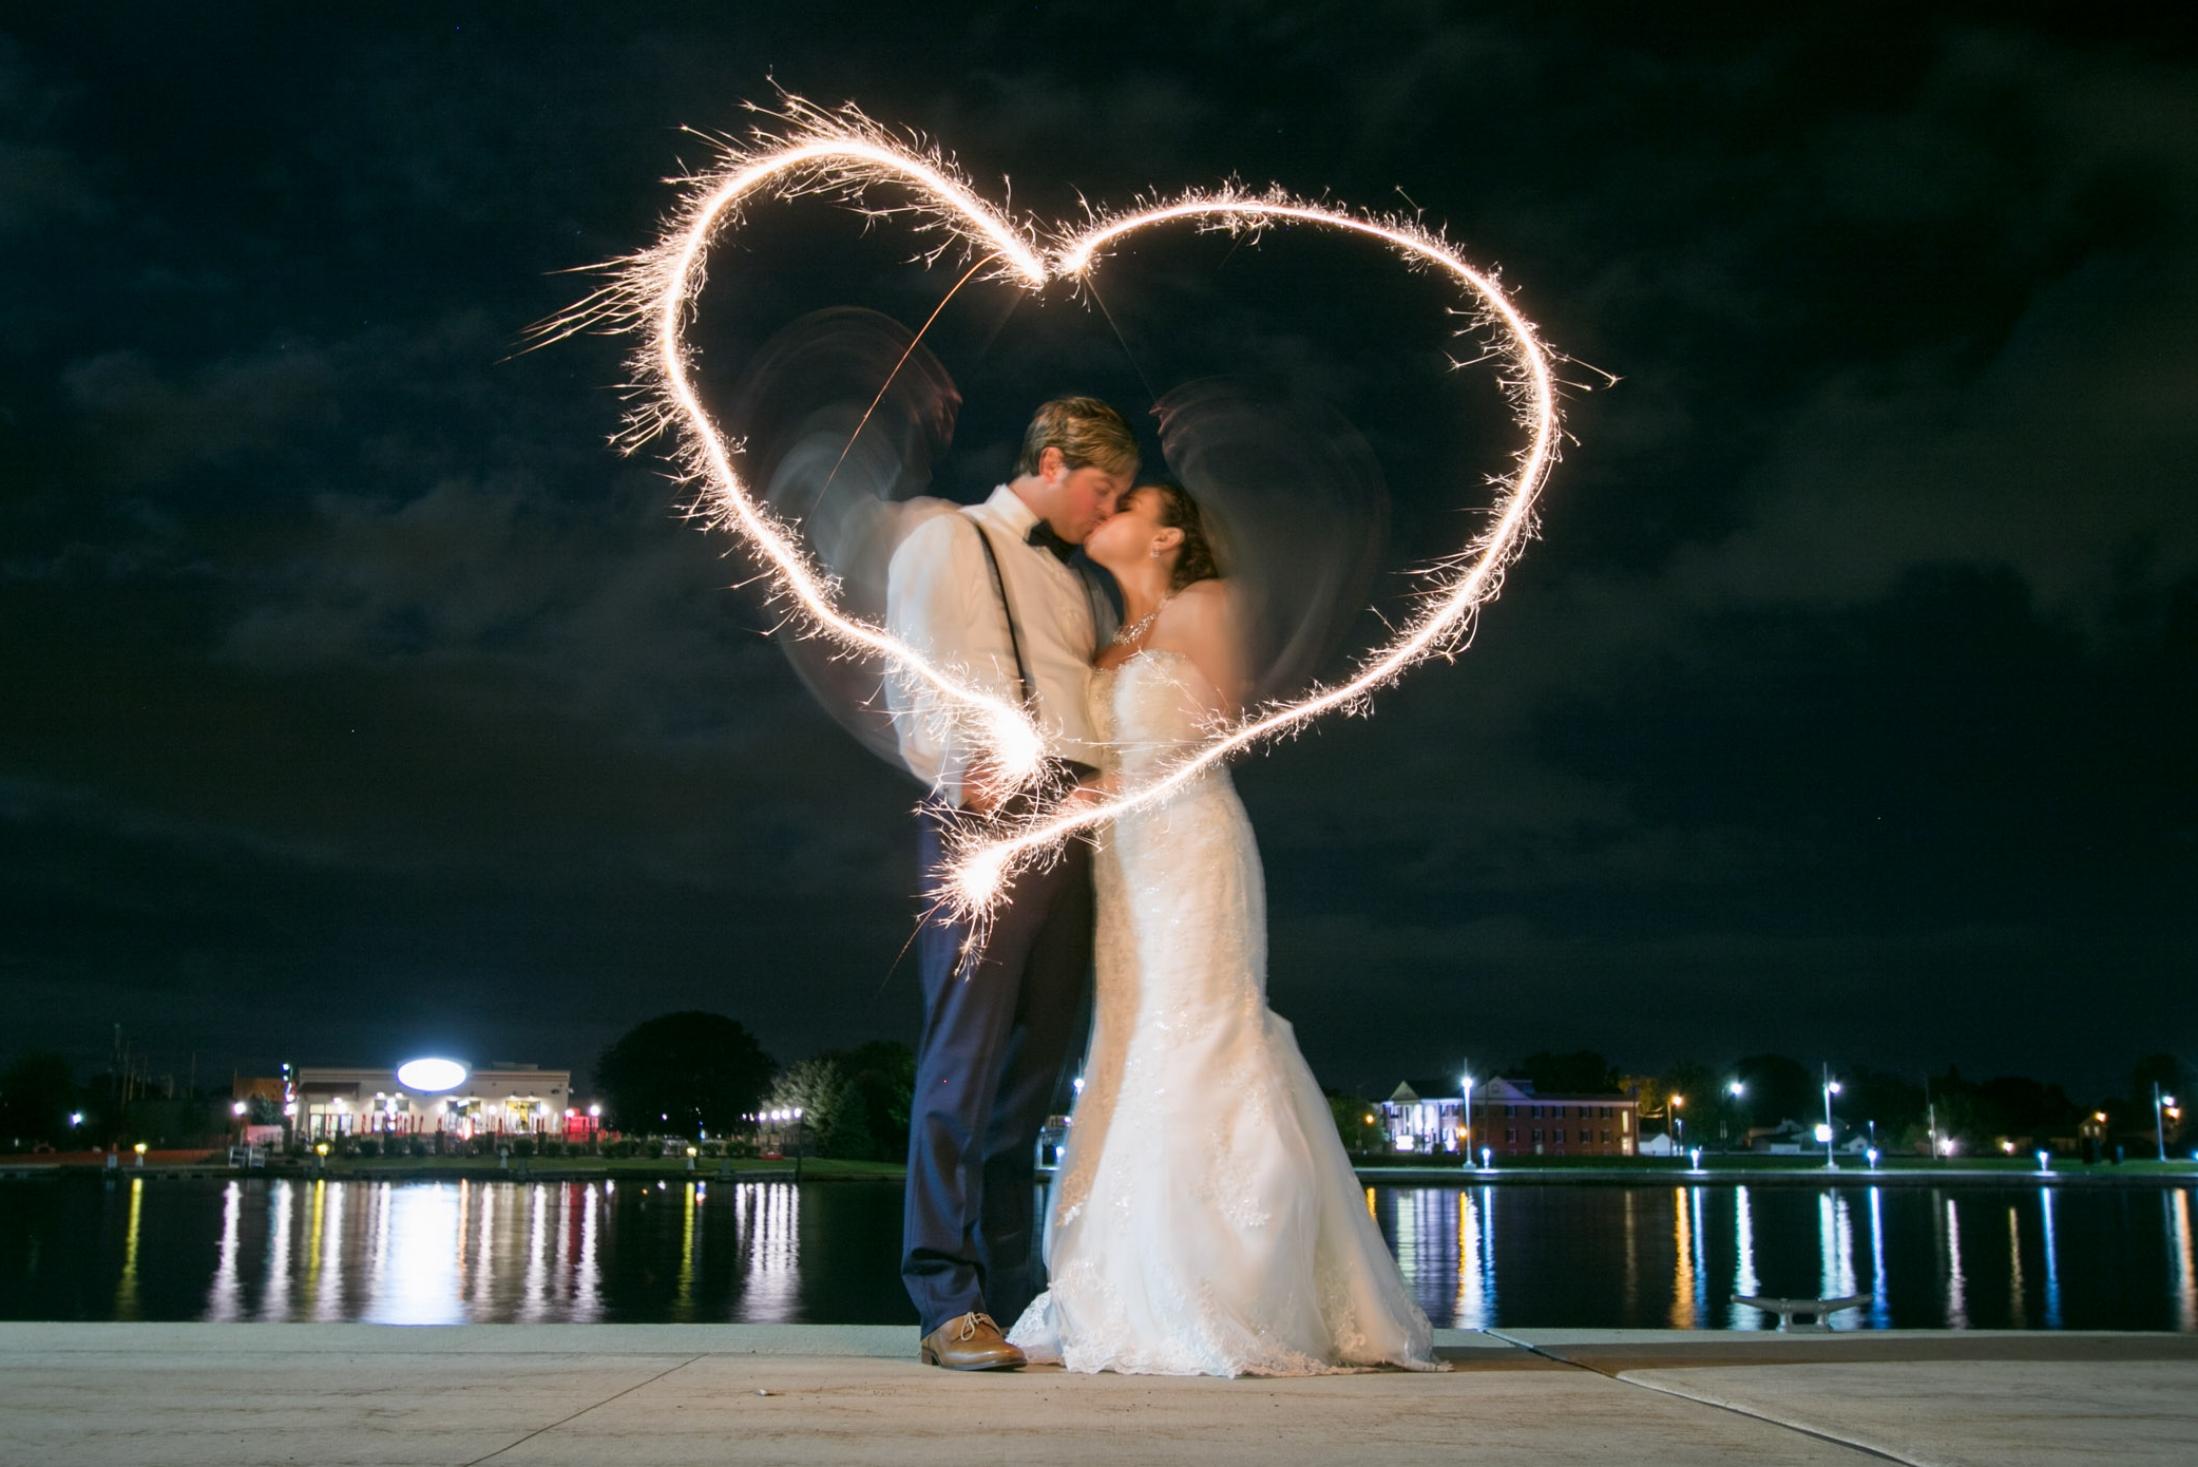 wedding-photo-long-exposure-heart-bride-groom-wedding-photographer-adam-shea-photography-green+bay-appleton-neenah-oshkosh-fond-du-lac-wisconsin-photos.jpg